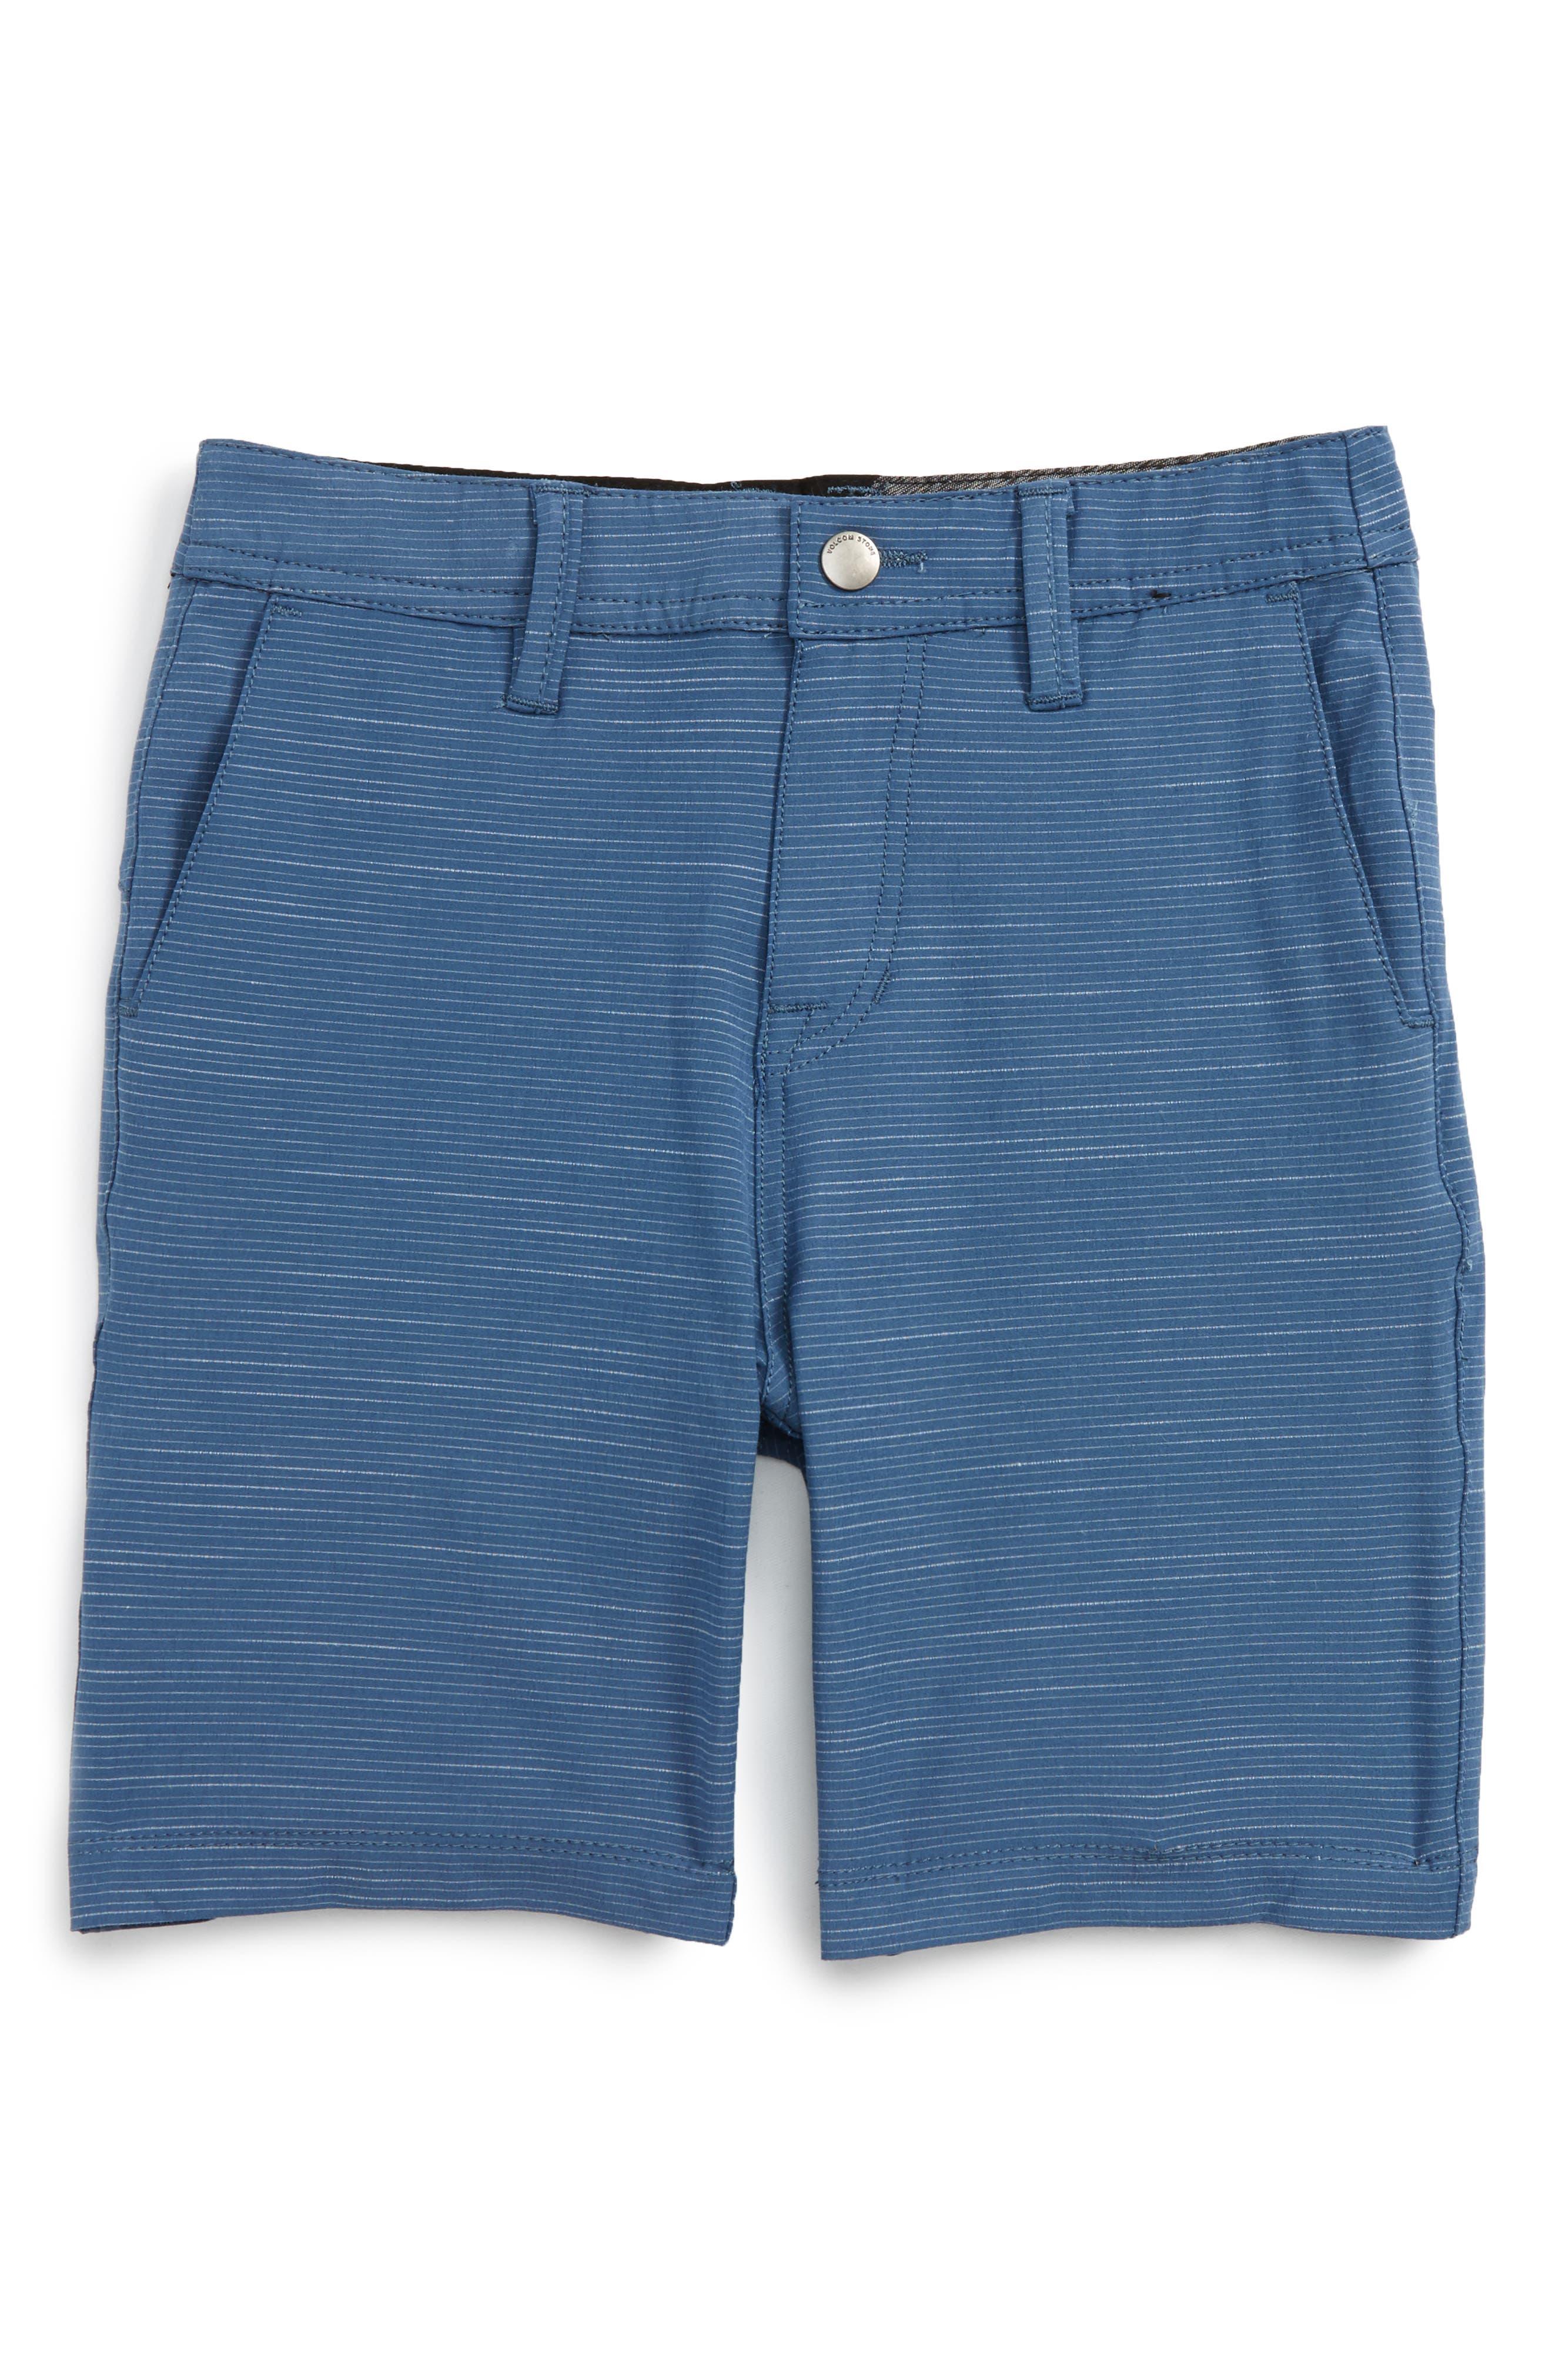 Surf N' Turf Hybrid Shorts,                             Main thumbnail 1, color,                             Blue Smoke